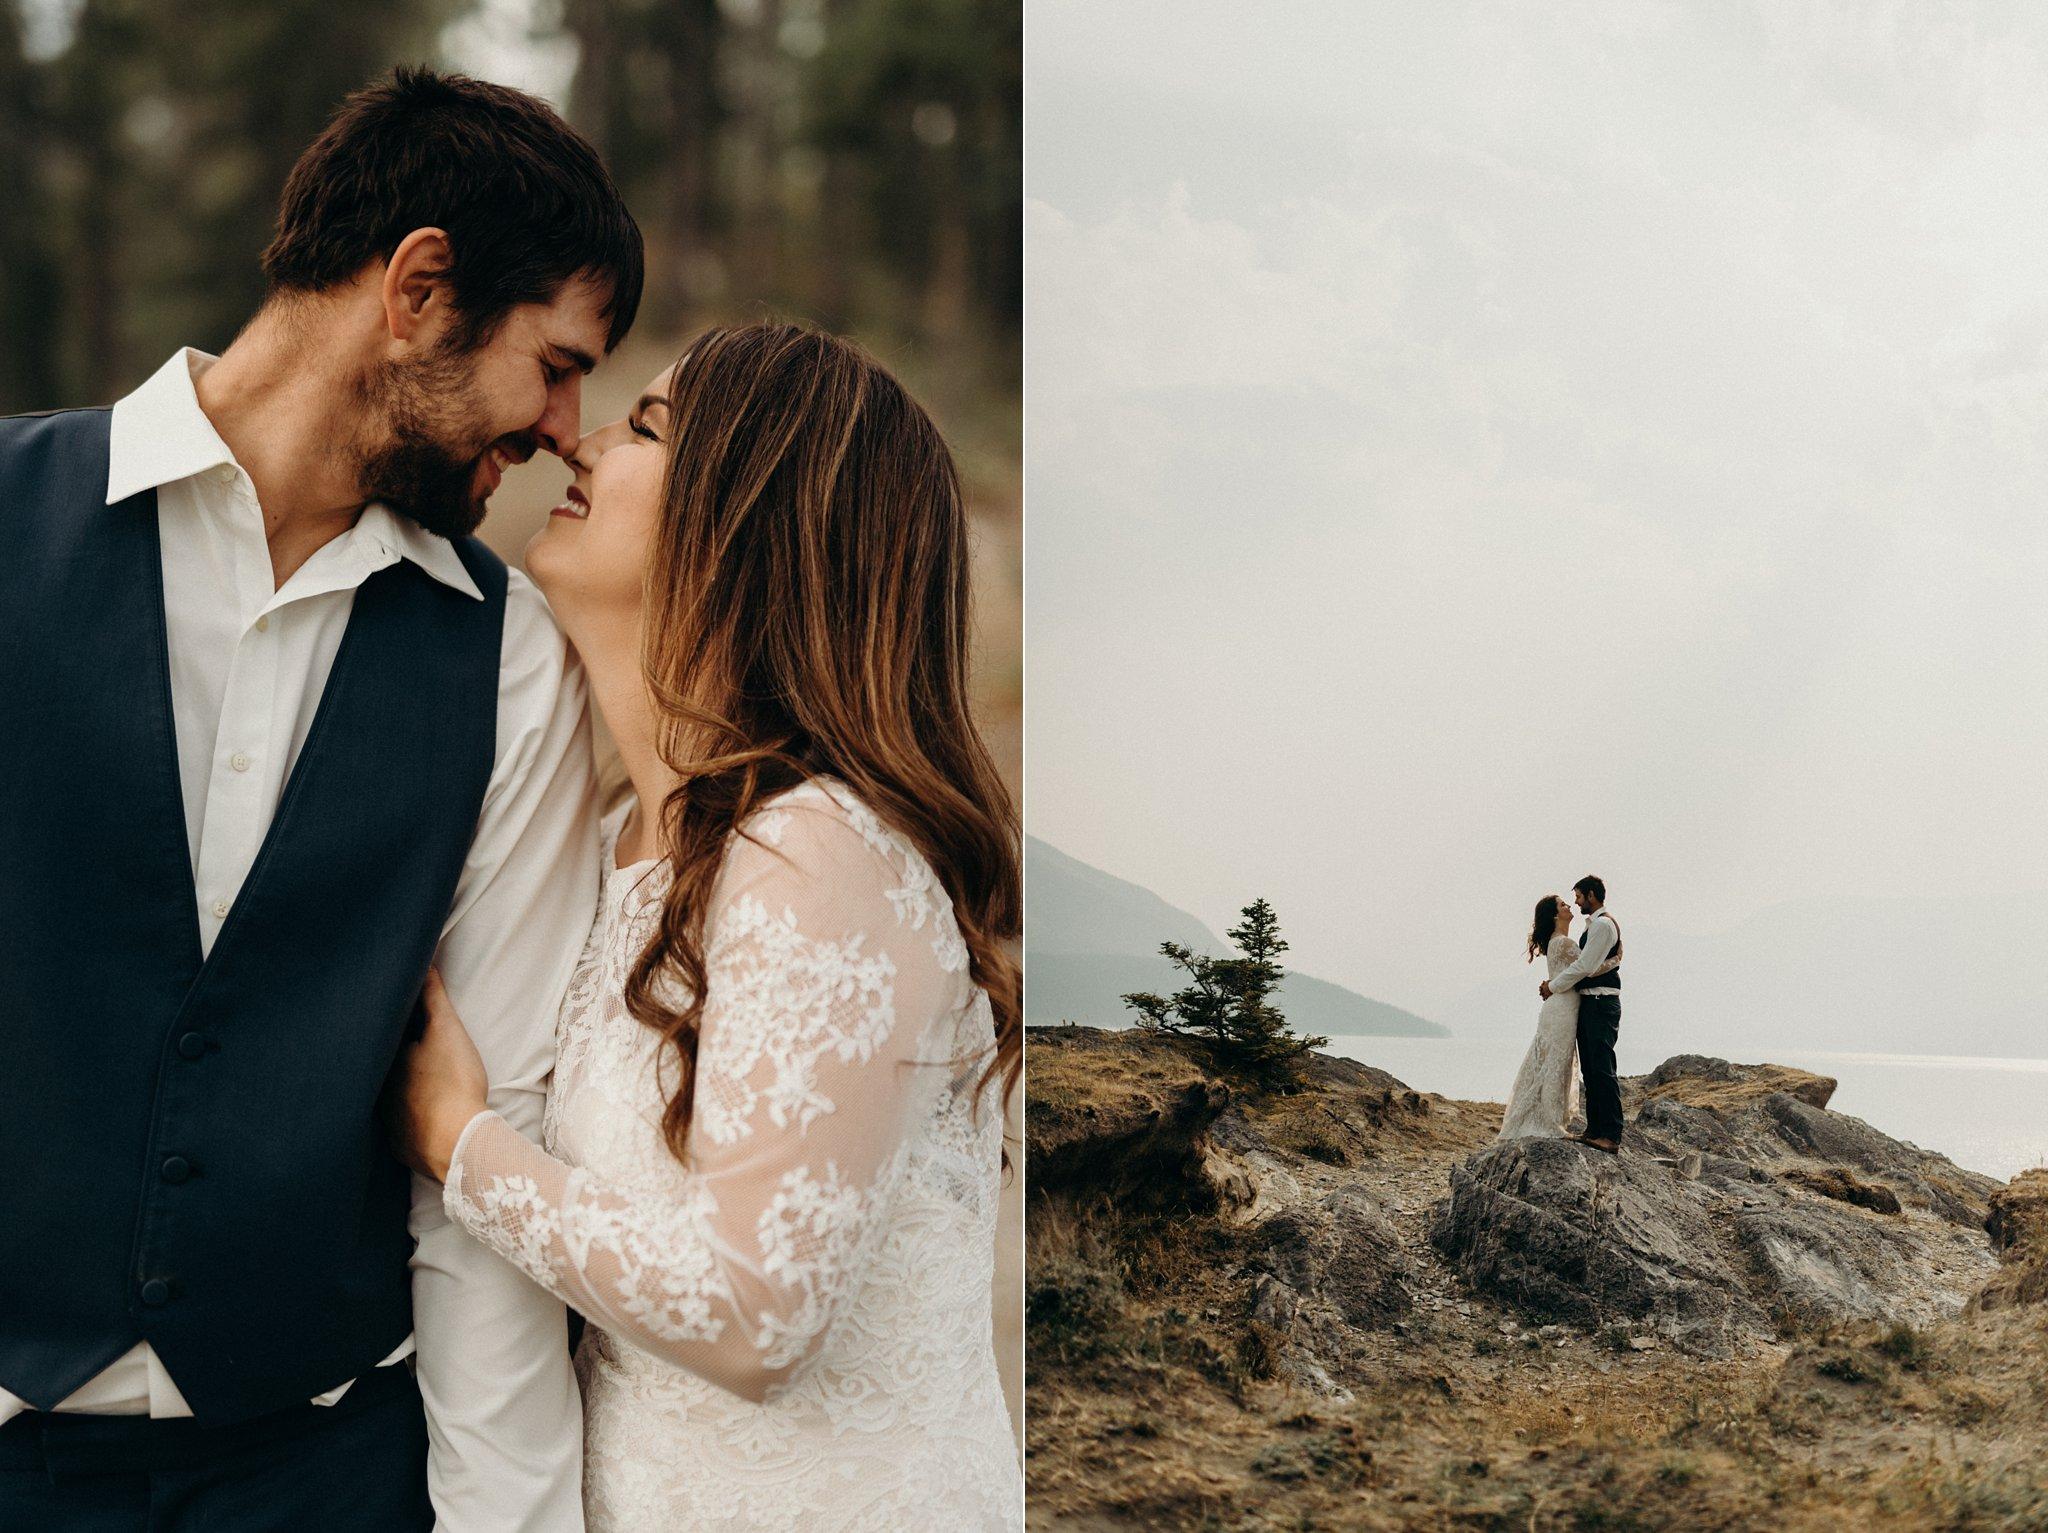 kaihla_tonai_intimate_wedding_elopement_photographer_6745.jpg